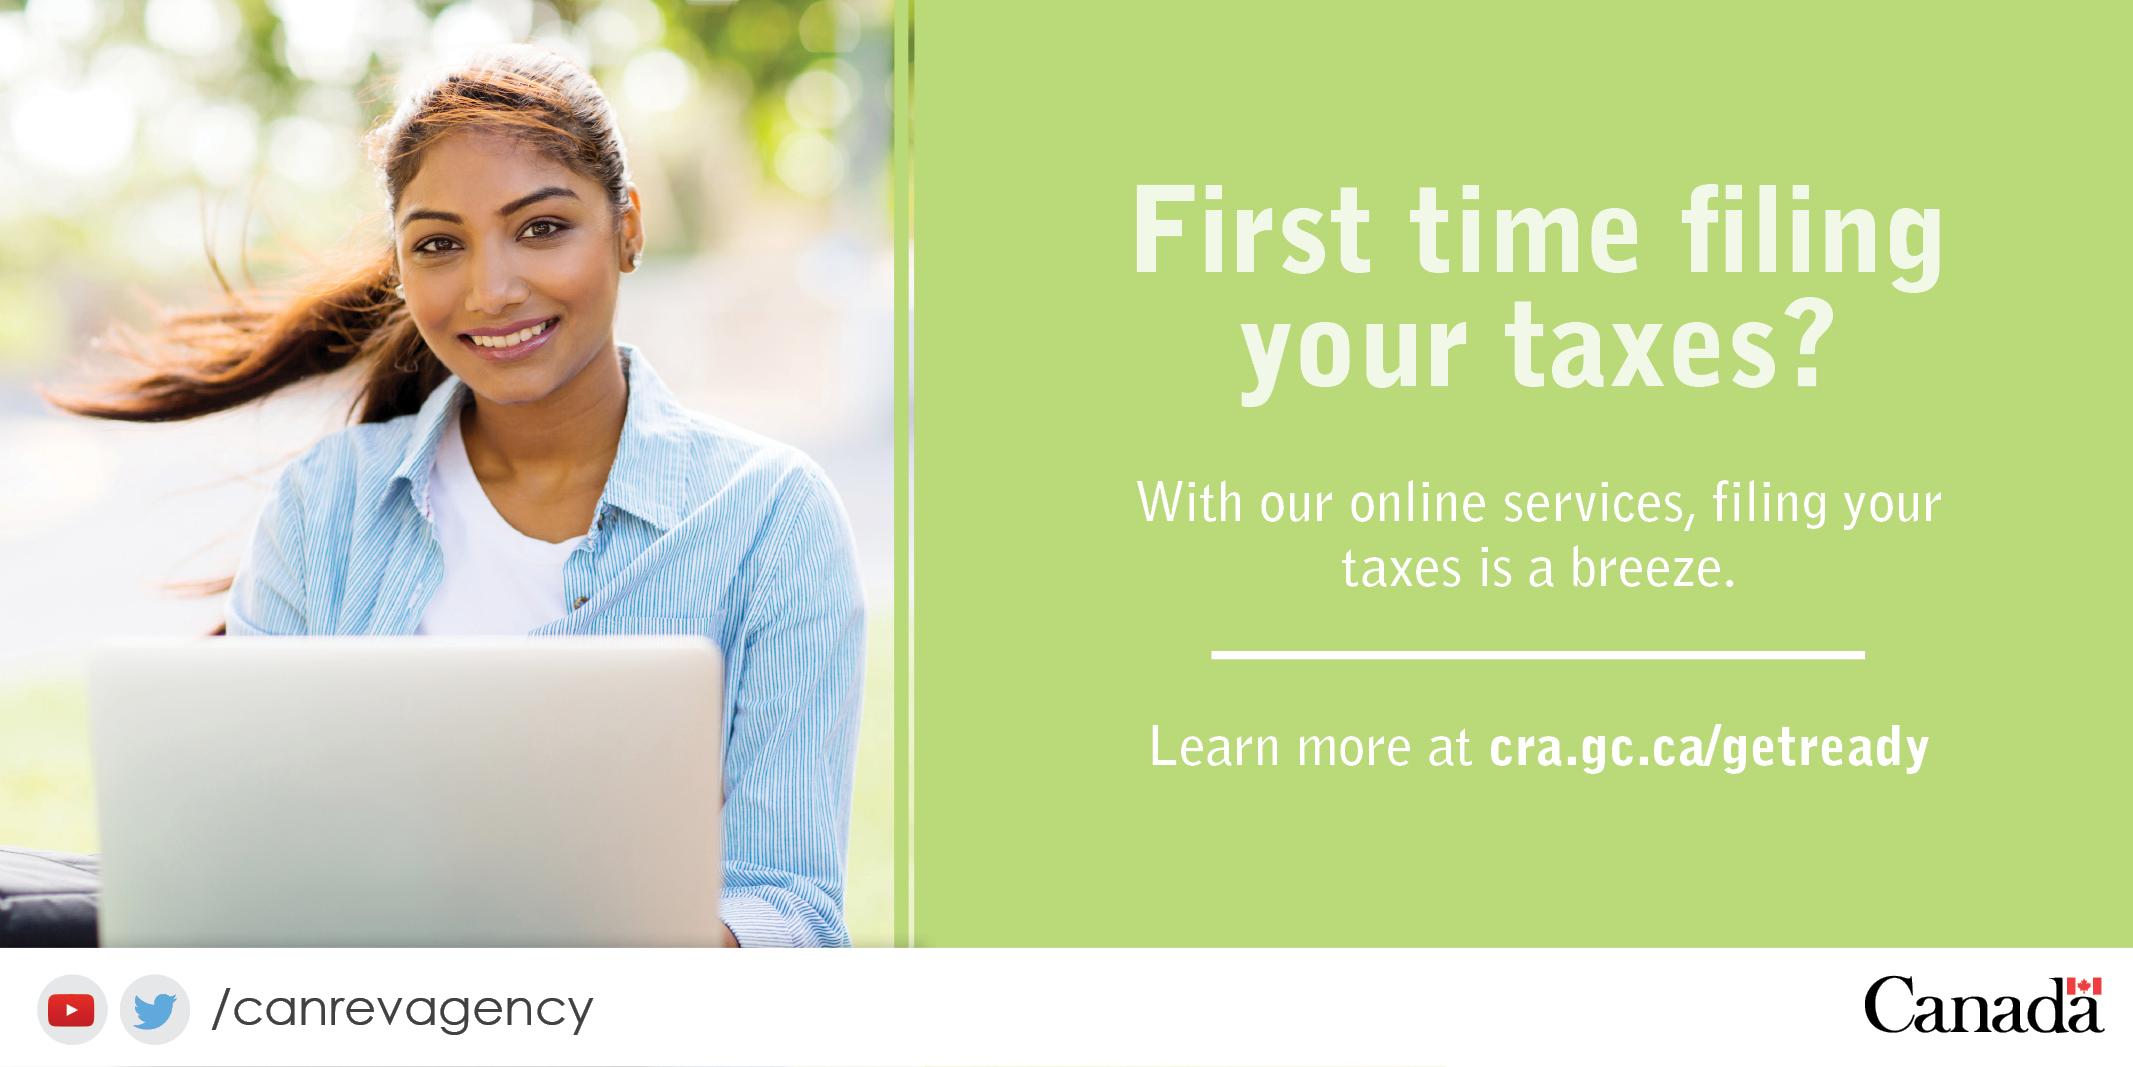 Tax filing season media kit canada jpg files 1170 347 1024 512 ccuart Images